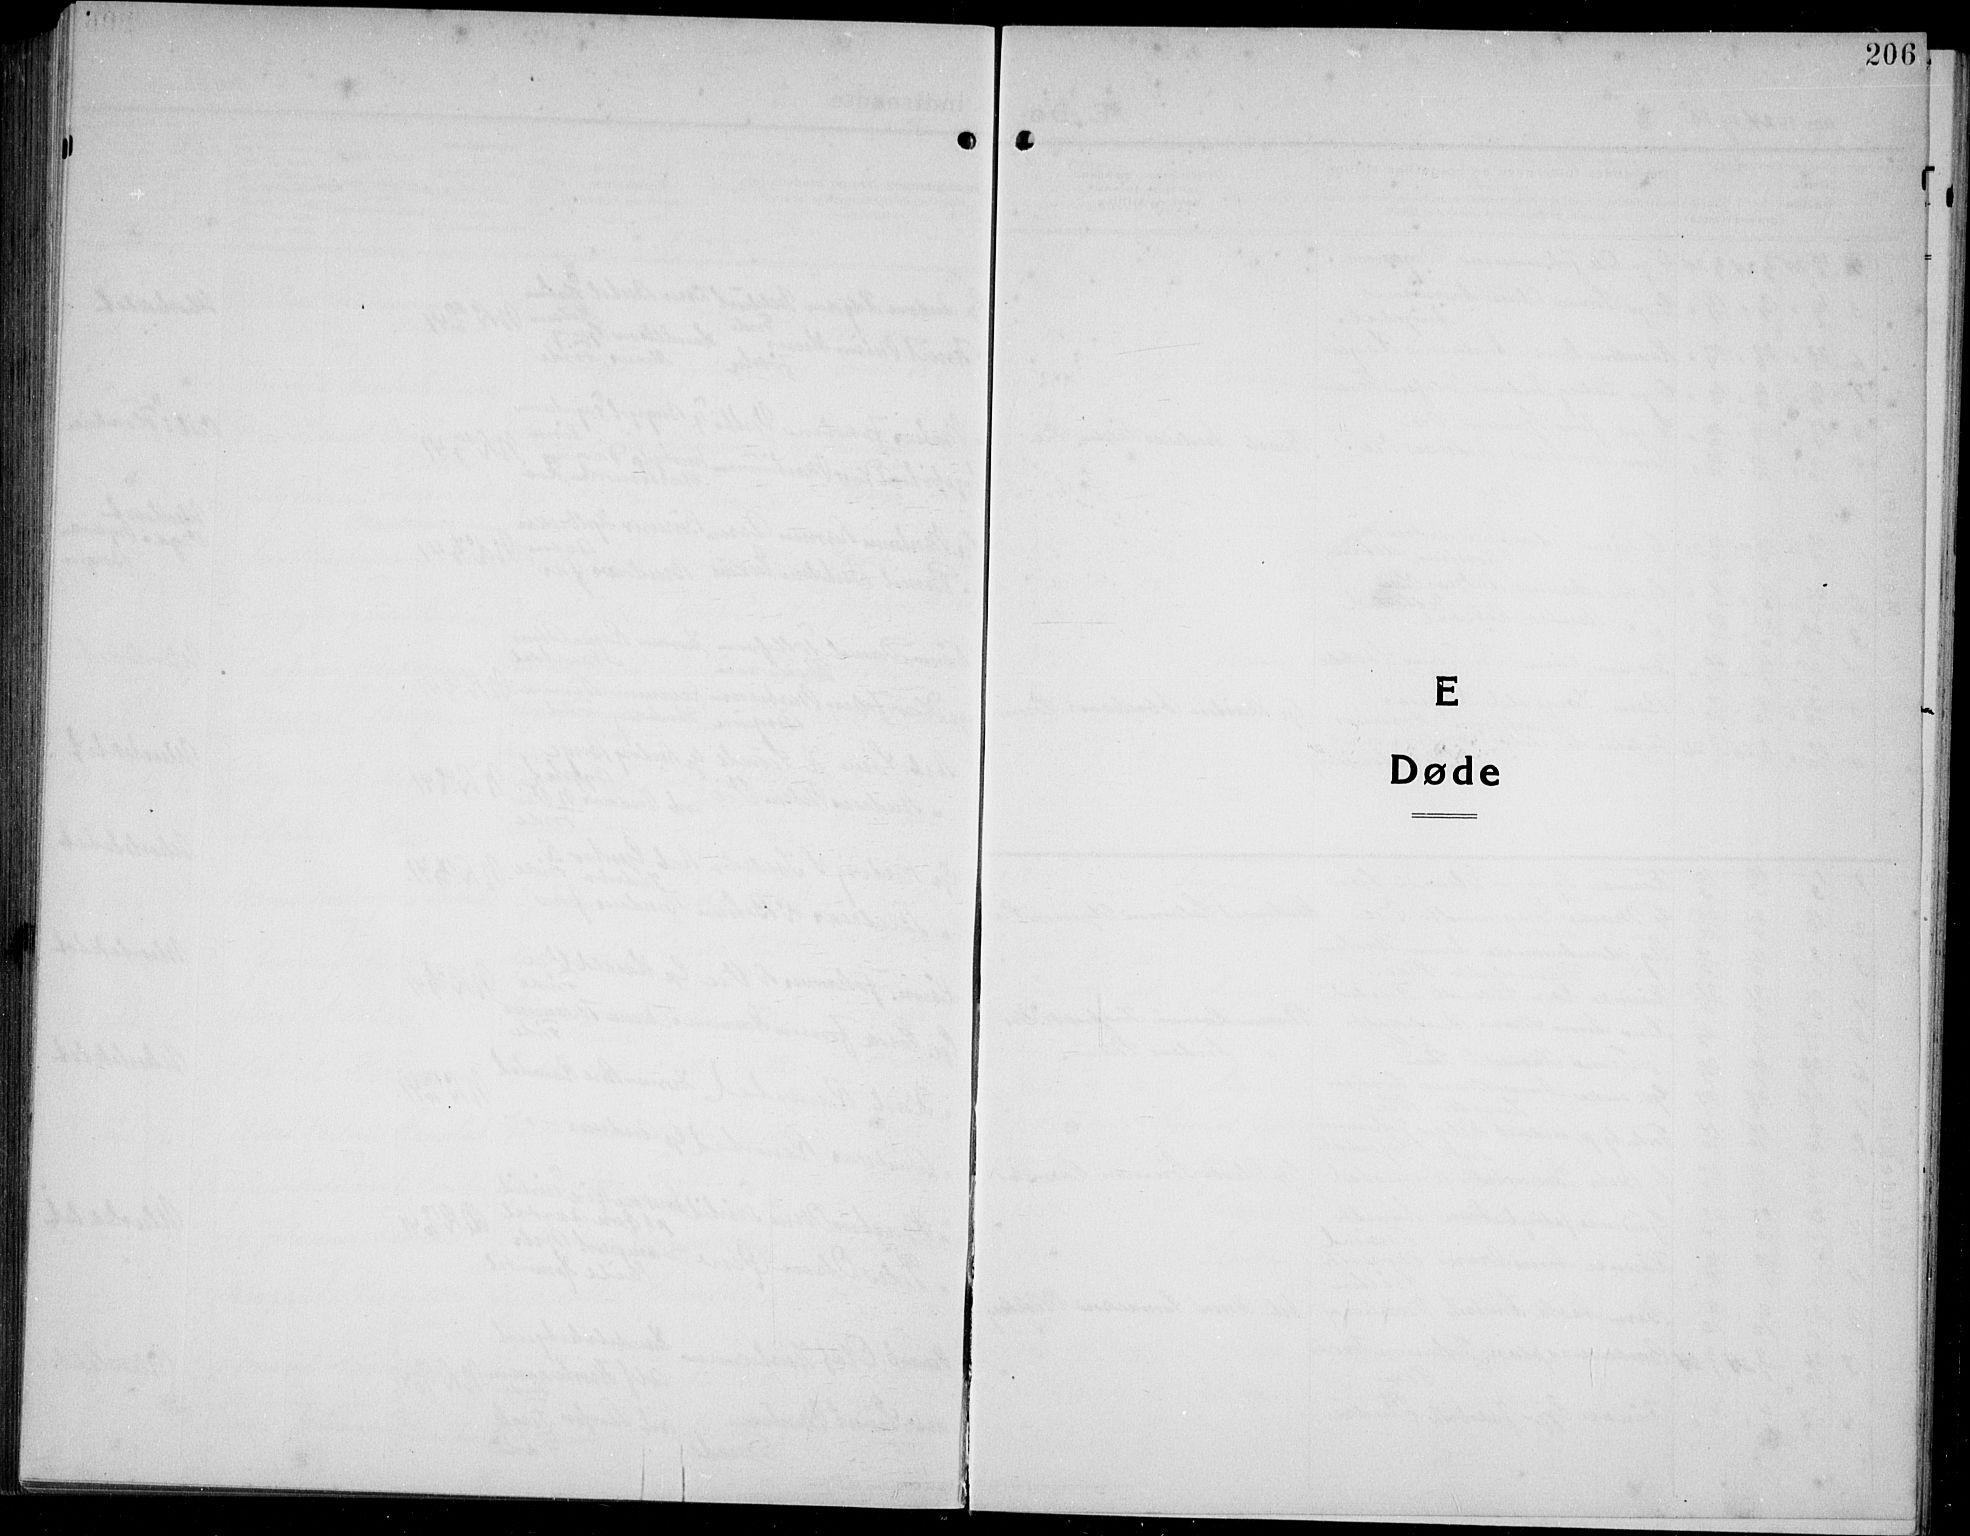 SAB, Førde Sokneprestembete, H/Hab: Klokkerbok nr. A 4, 1924-1941, s. 206